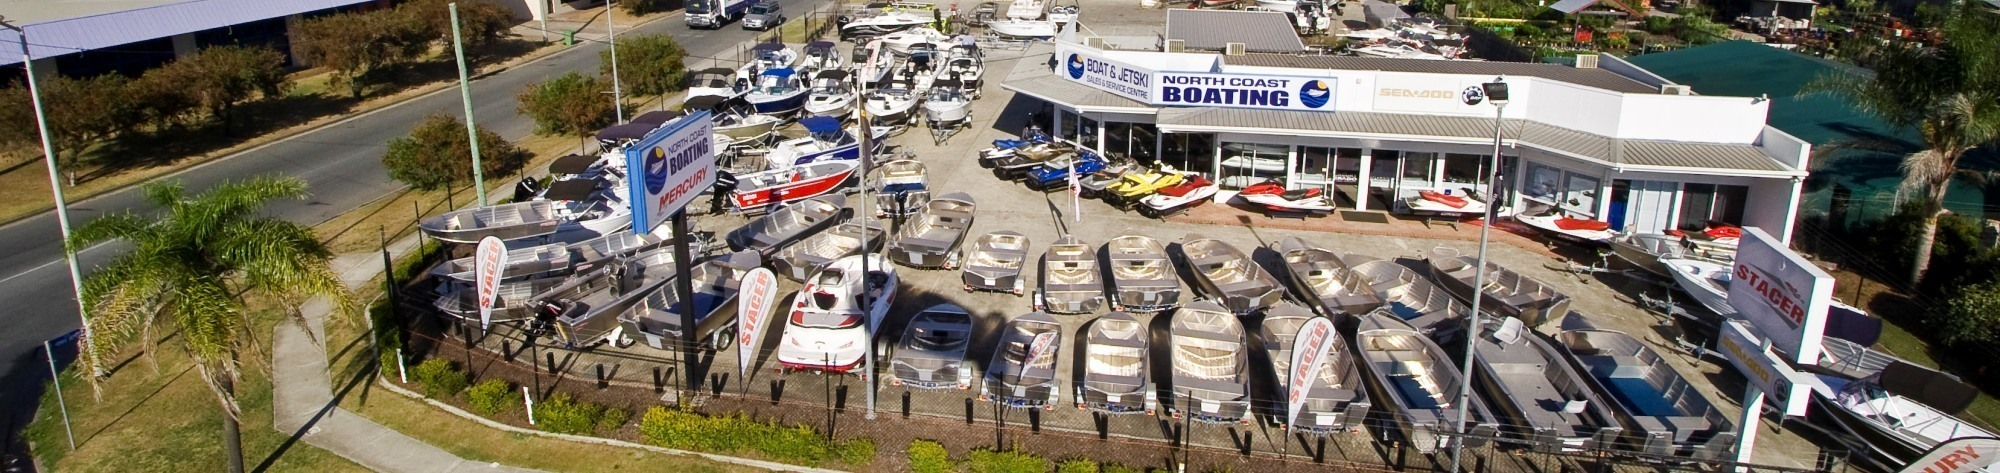 North Coast Boating   Boat Shop Sunshine Coast   Our Yard